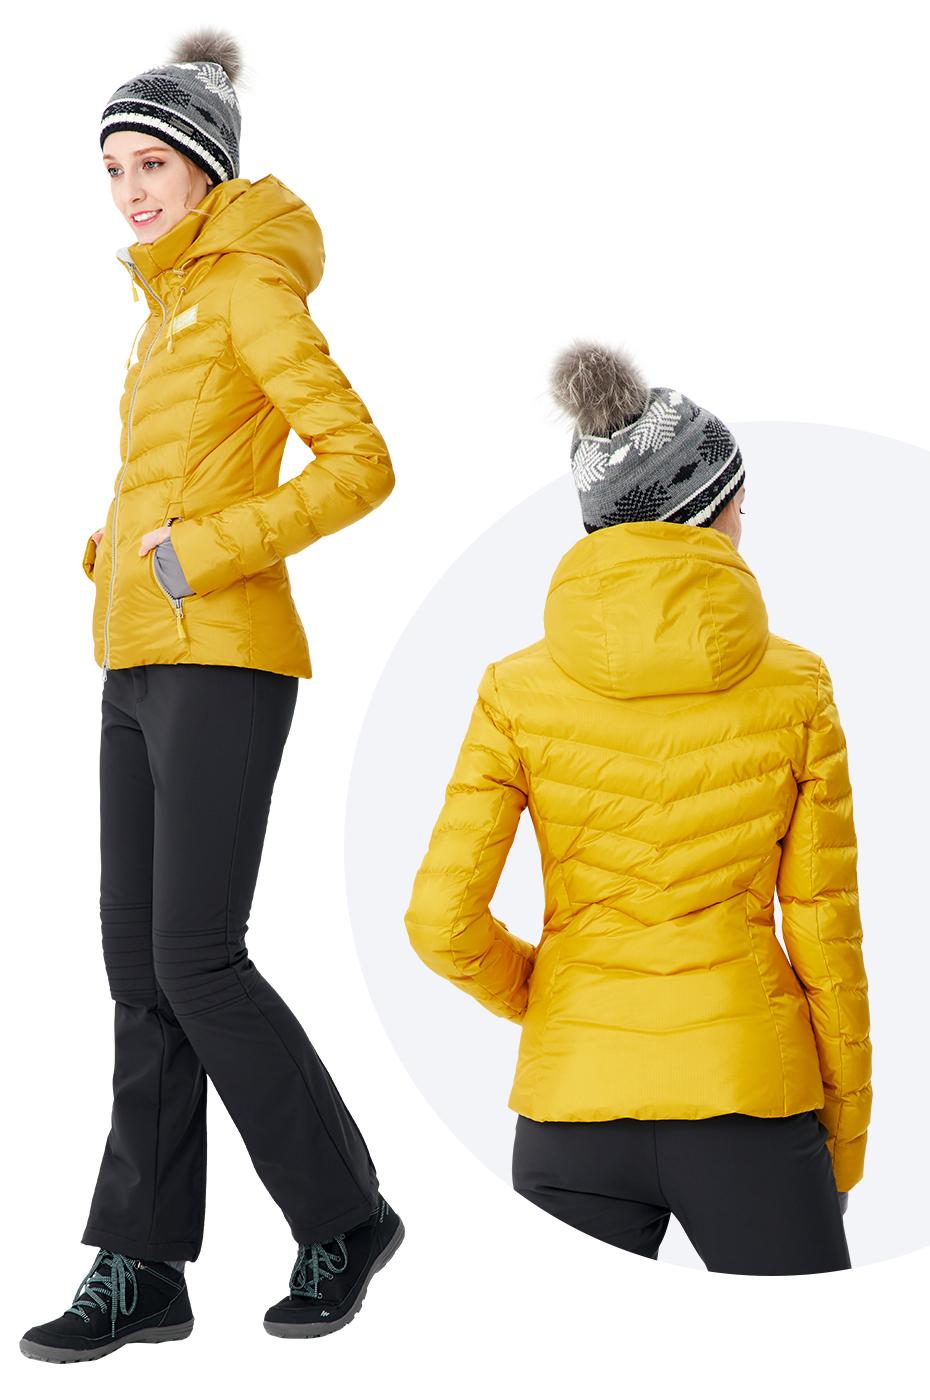 Running river奔流极限 女士户外时尚短款防水单双板加厚保暖滑雪服上衣棉服冬季D8162 灰色088 L